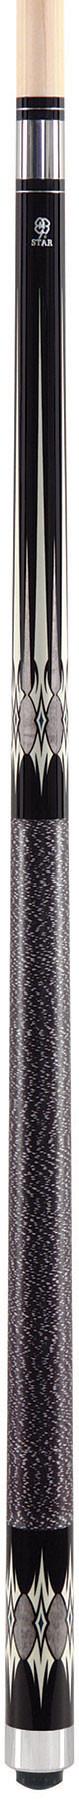 McDermott Star S51 Pool Cue - Black/Grey